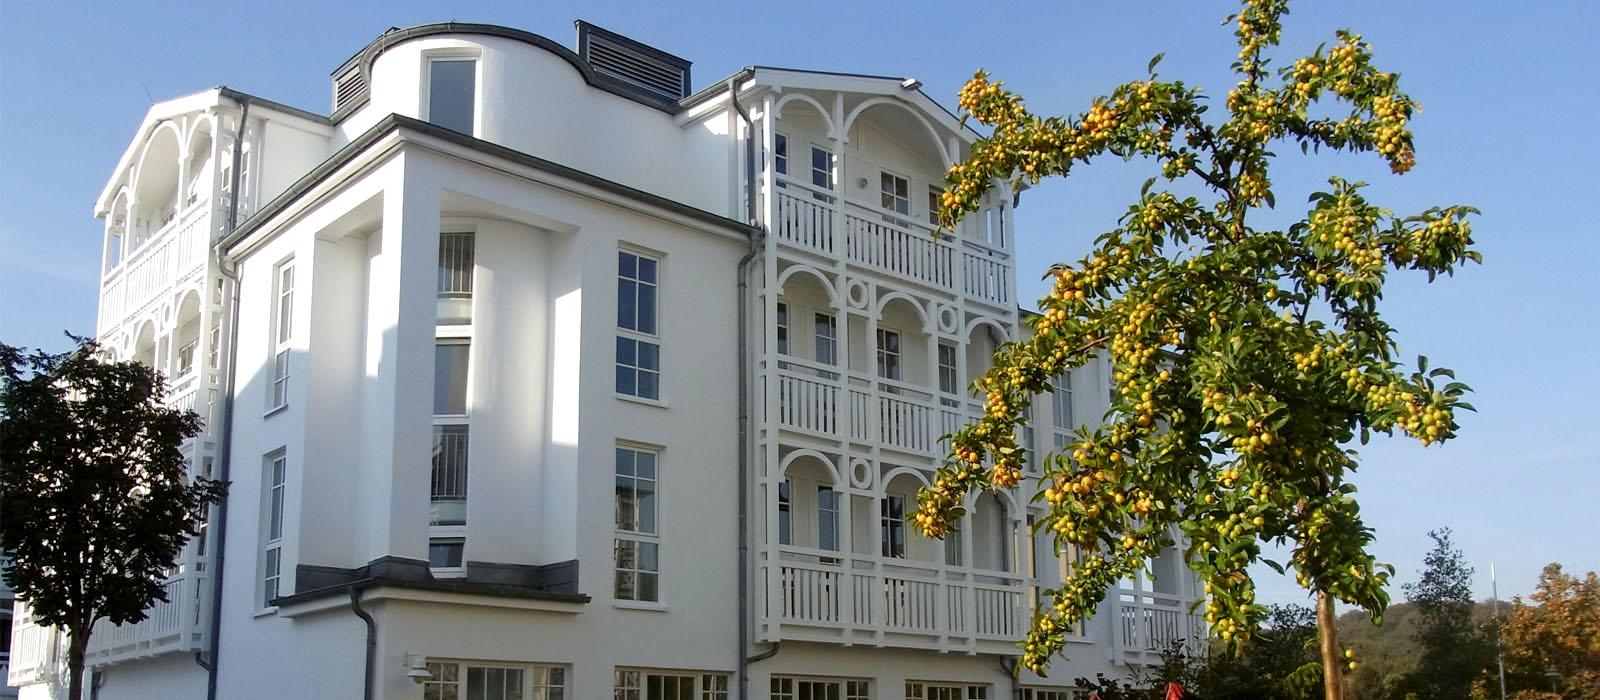 Home ferienwohnungen im seepark sellin for Fewo sellin